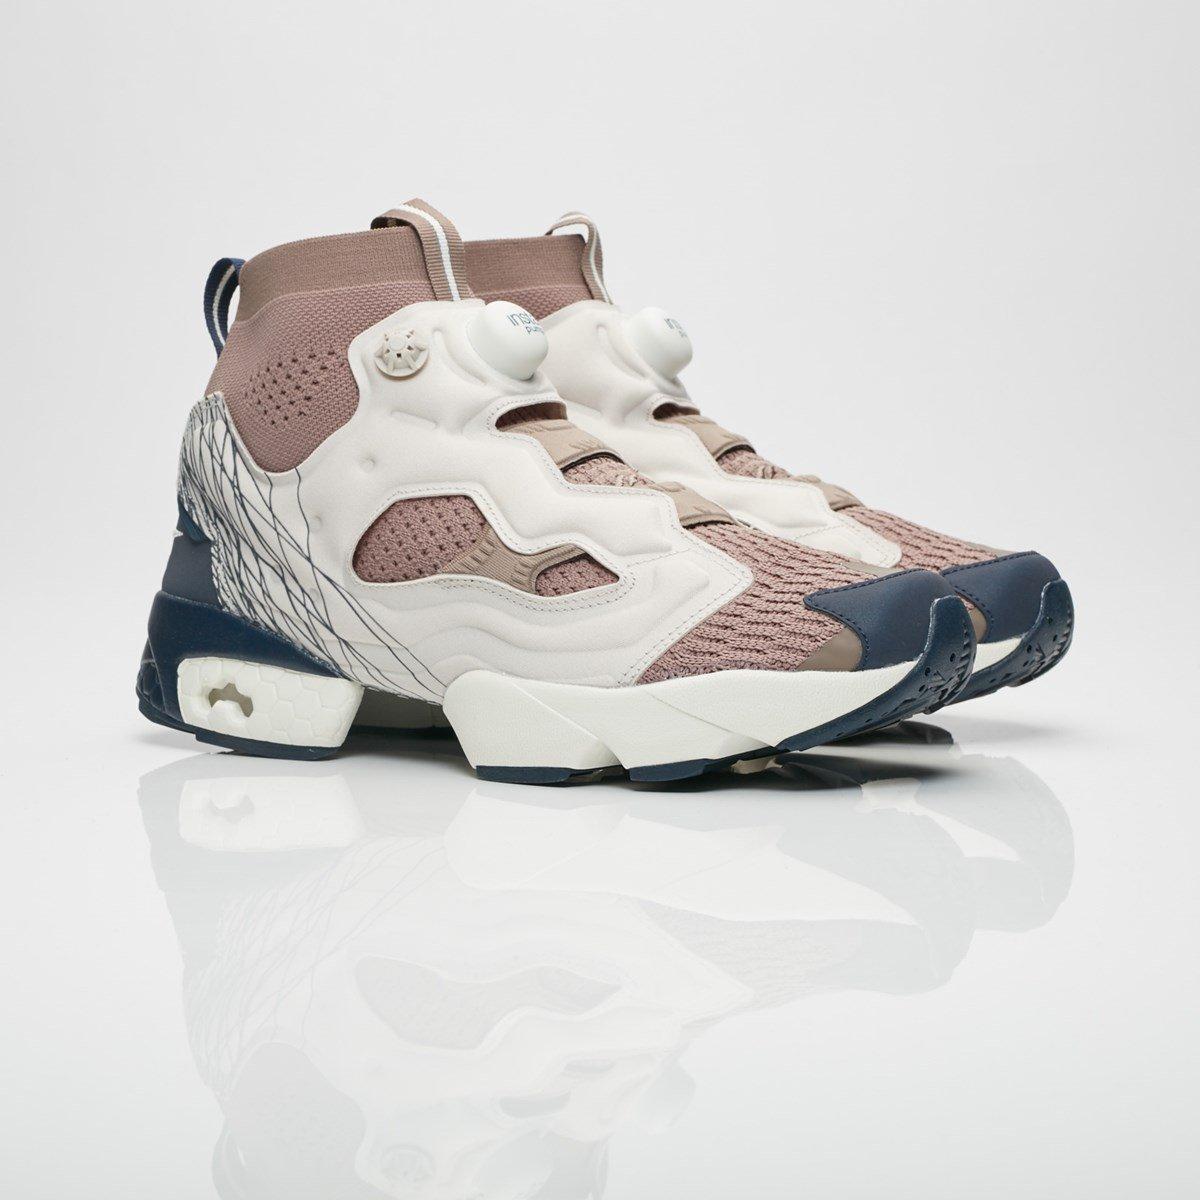 online retailer 8978c f9d4e reebok instapump fury og u stone bs8160 sneakers   streetwear på nätet sen  1999. SNEAKERSNSTUFF